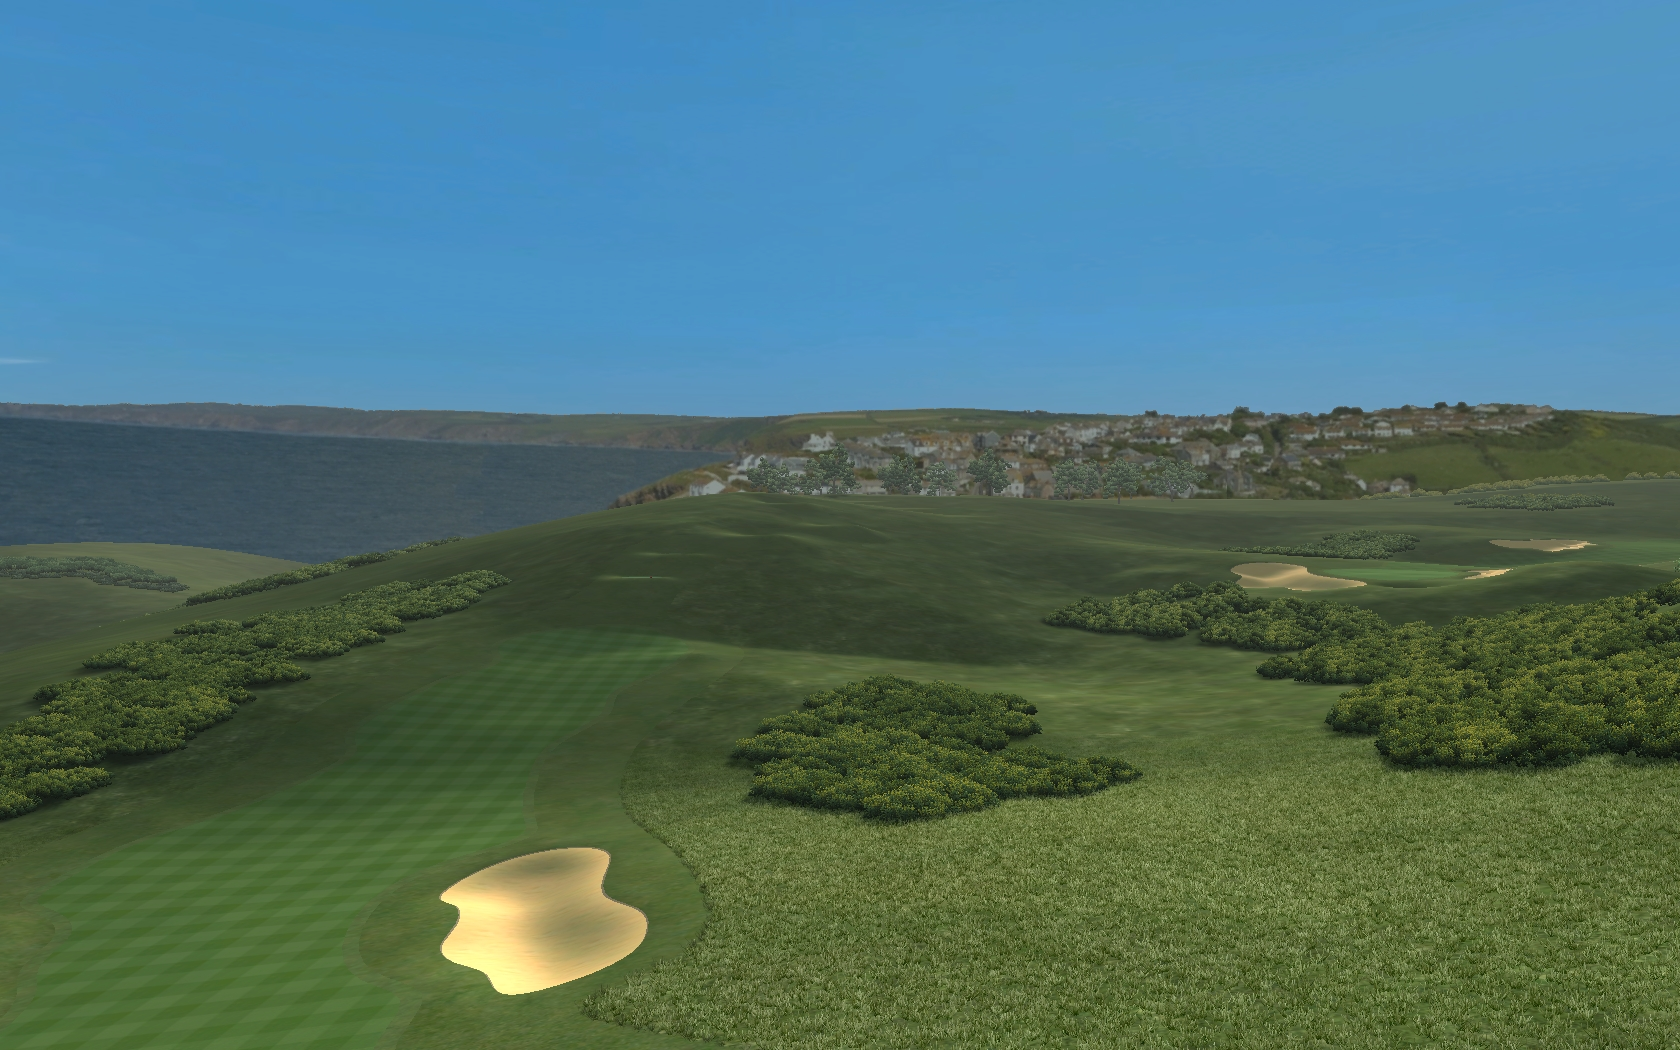 Picture of Xanadu Island Golf Club - click to view original size